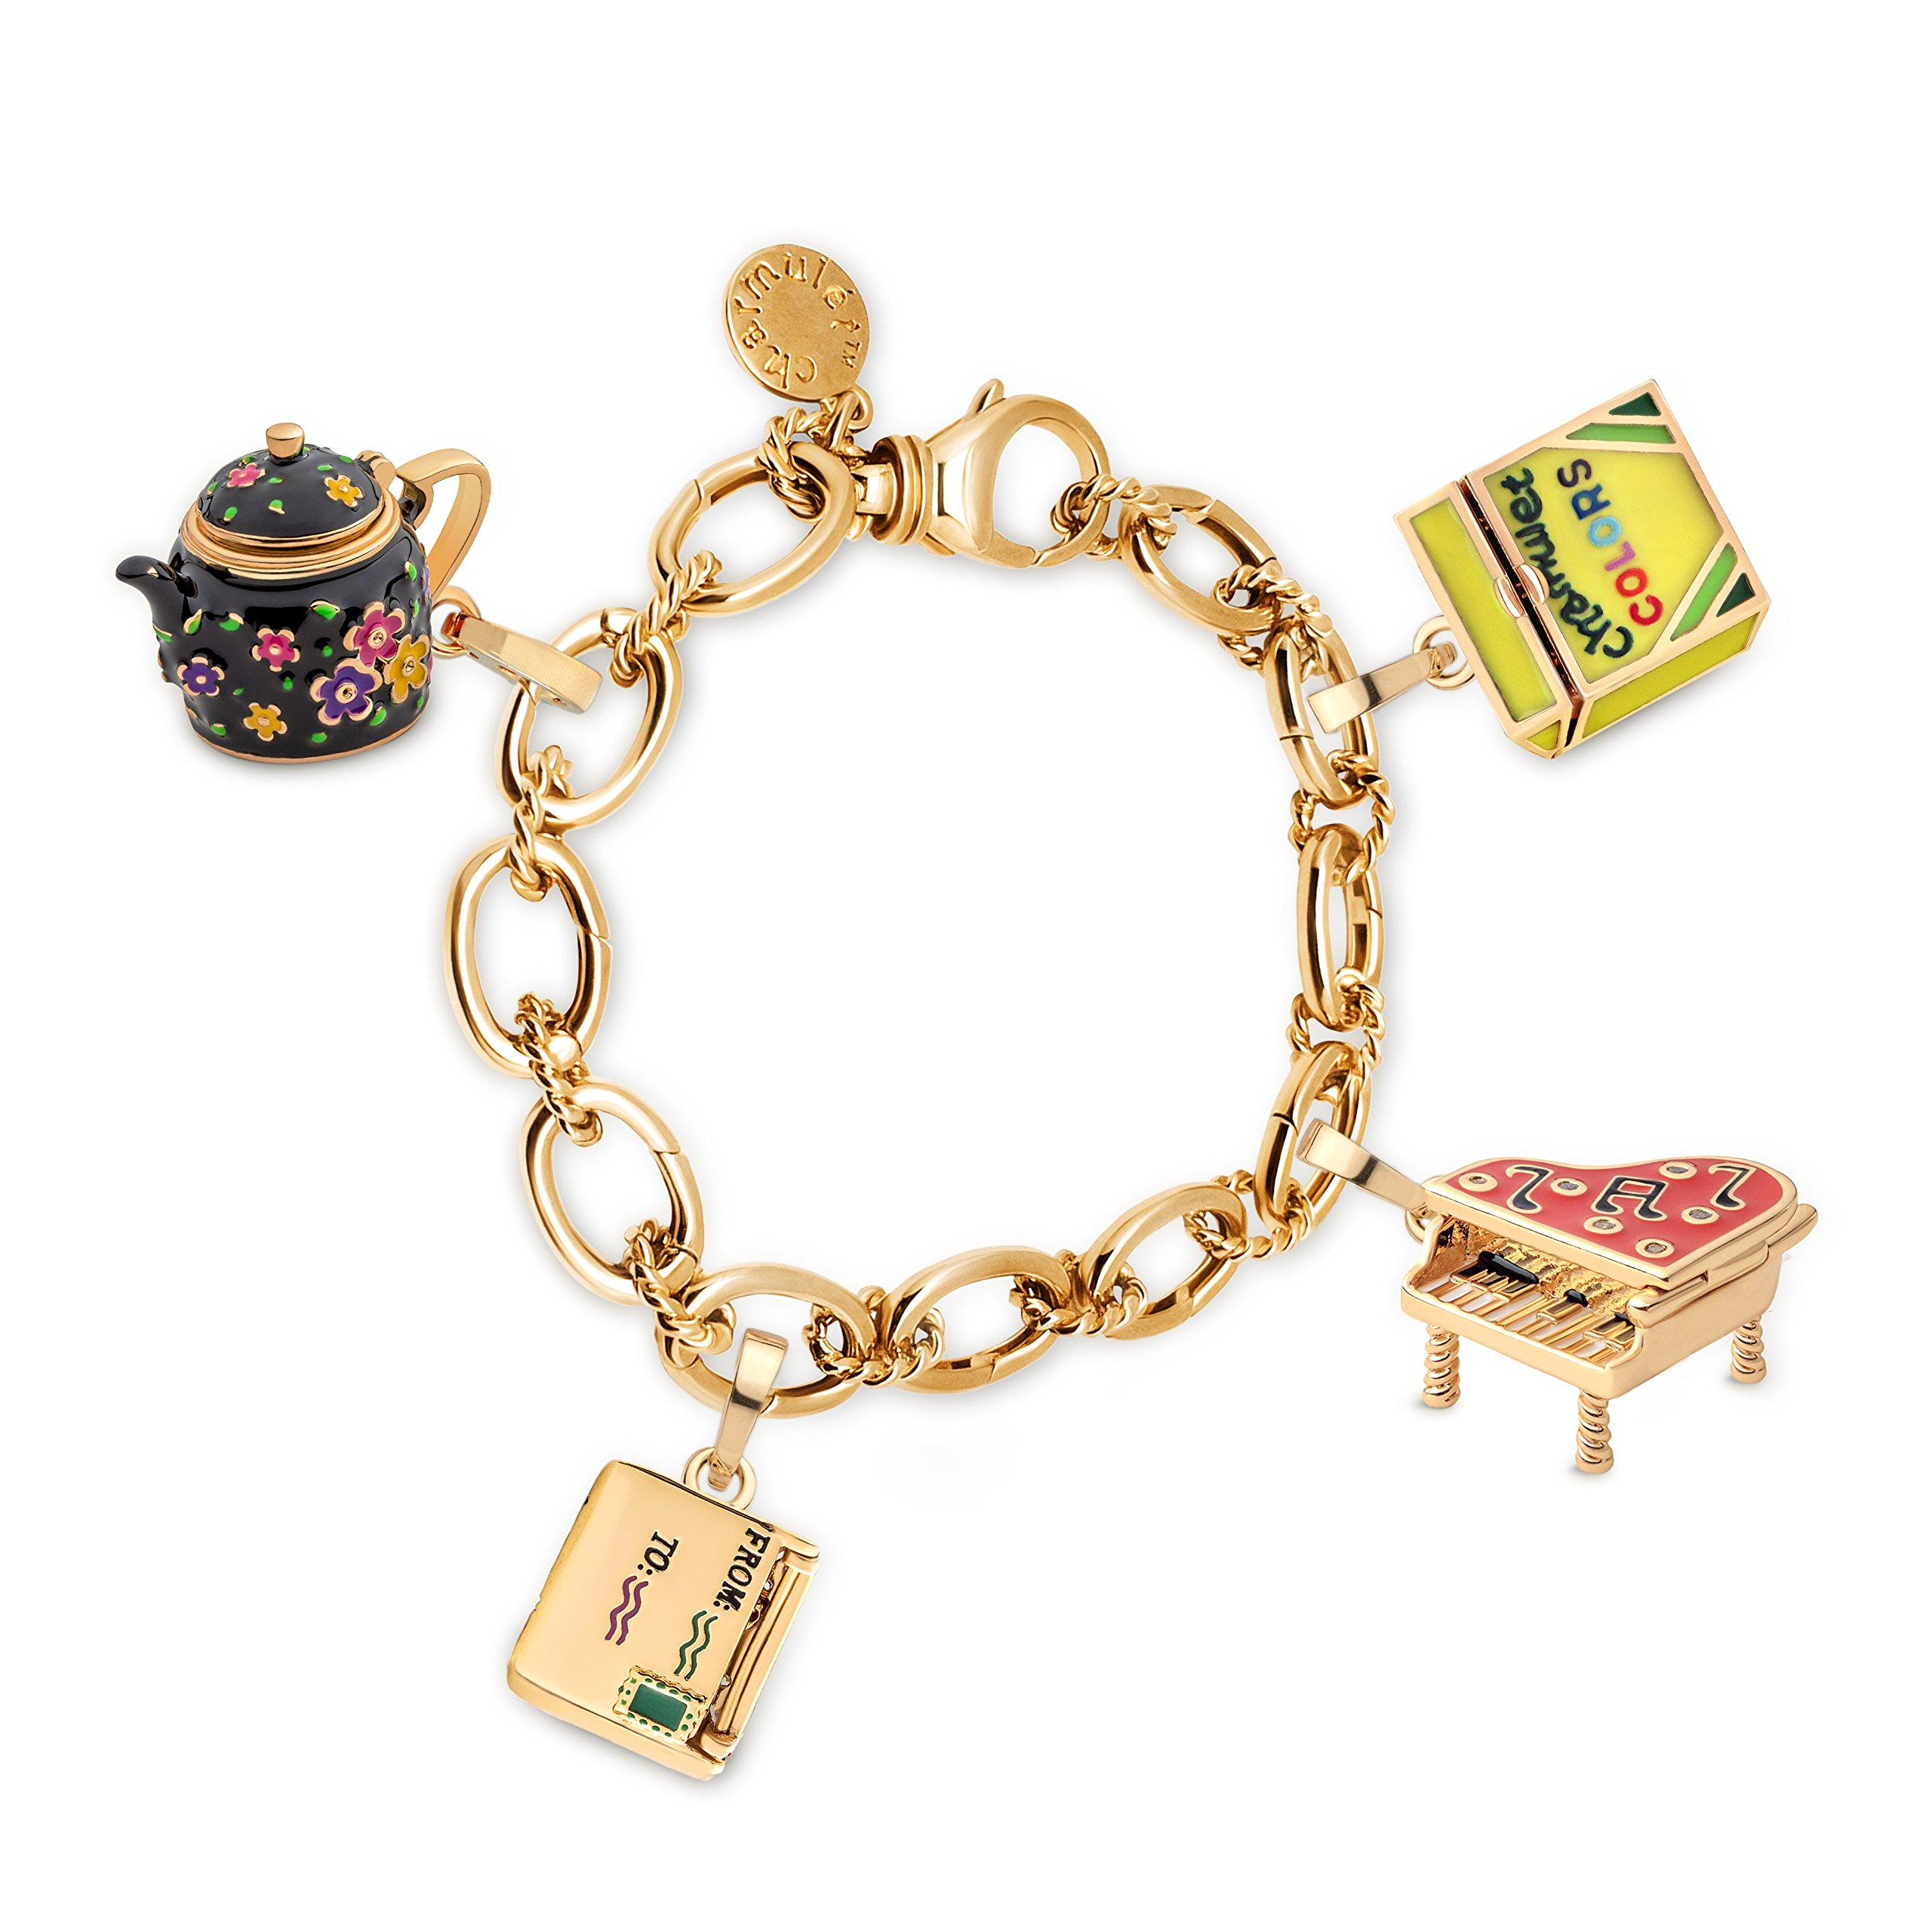 Charmulét CHARMULET 14k Plated Gold Charm Bracelet 5 - Charm Set Gift Box Included (4 Charms Black Teapot-Piano-Crayons-Envelop) by Charmulét (Image #1)